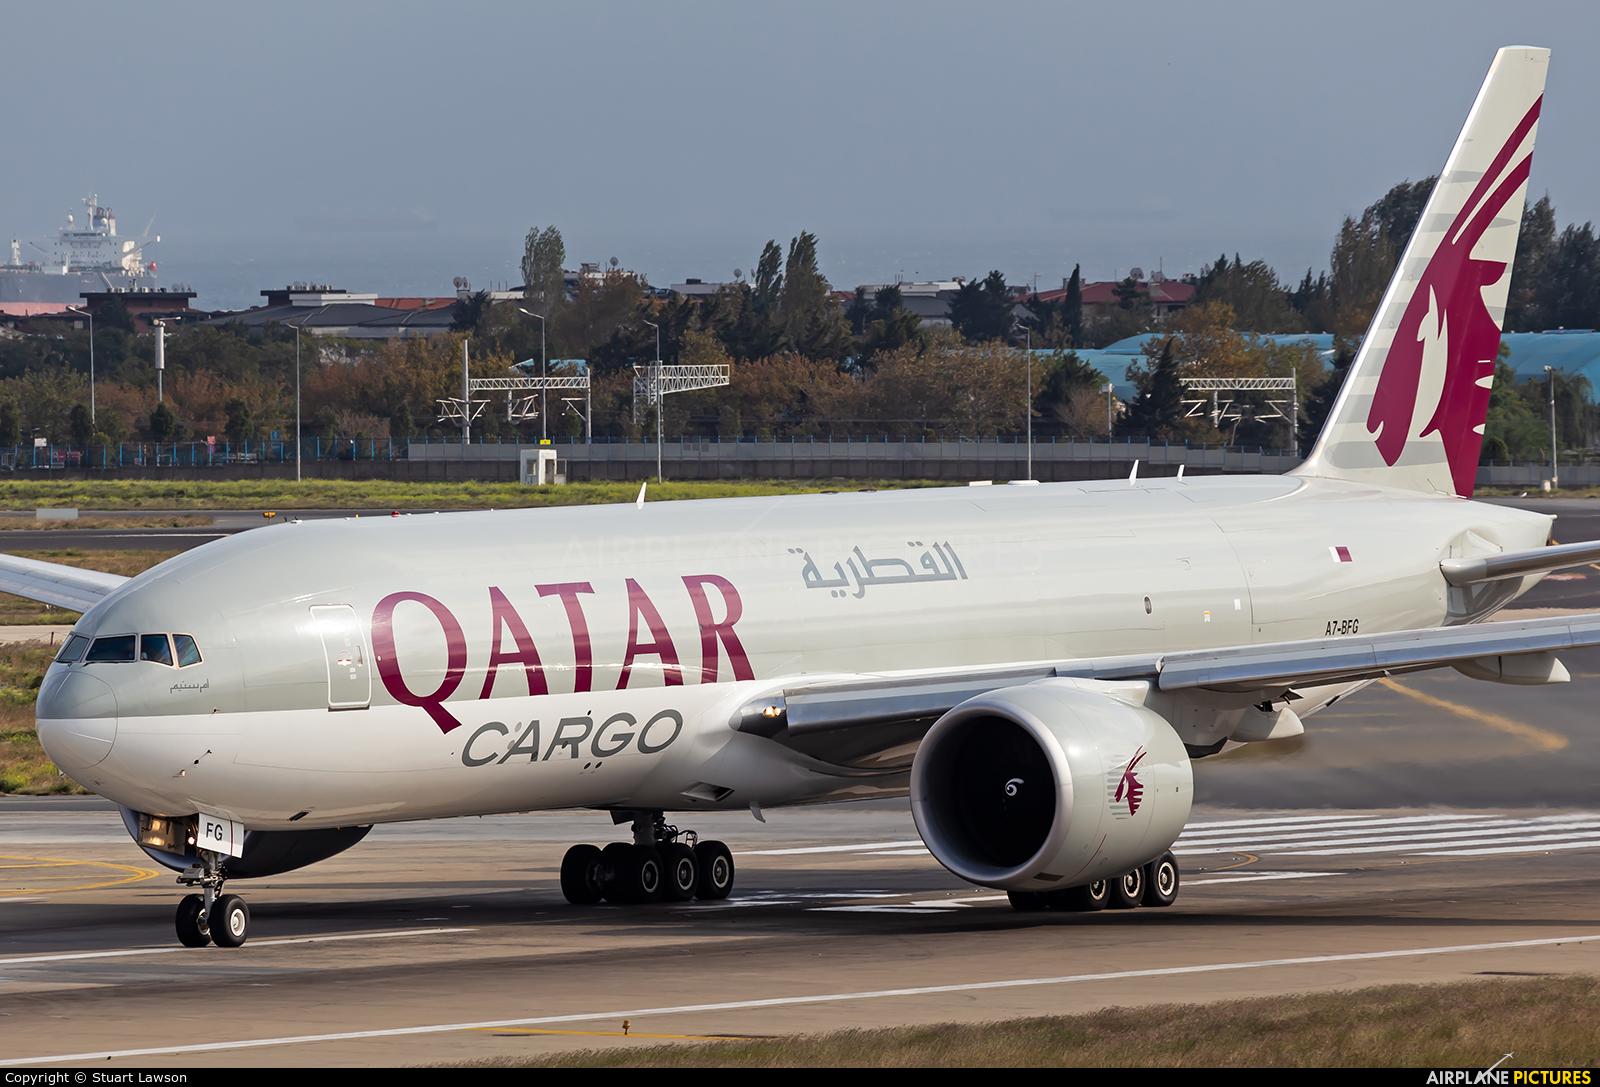 Qatar Airways Cargo A7-BFG aircraft at Istanbul - Ataturk